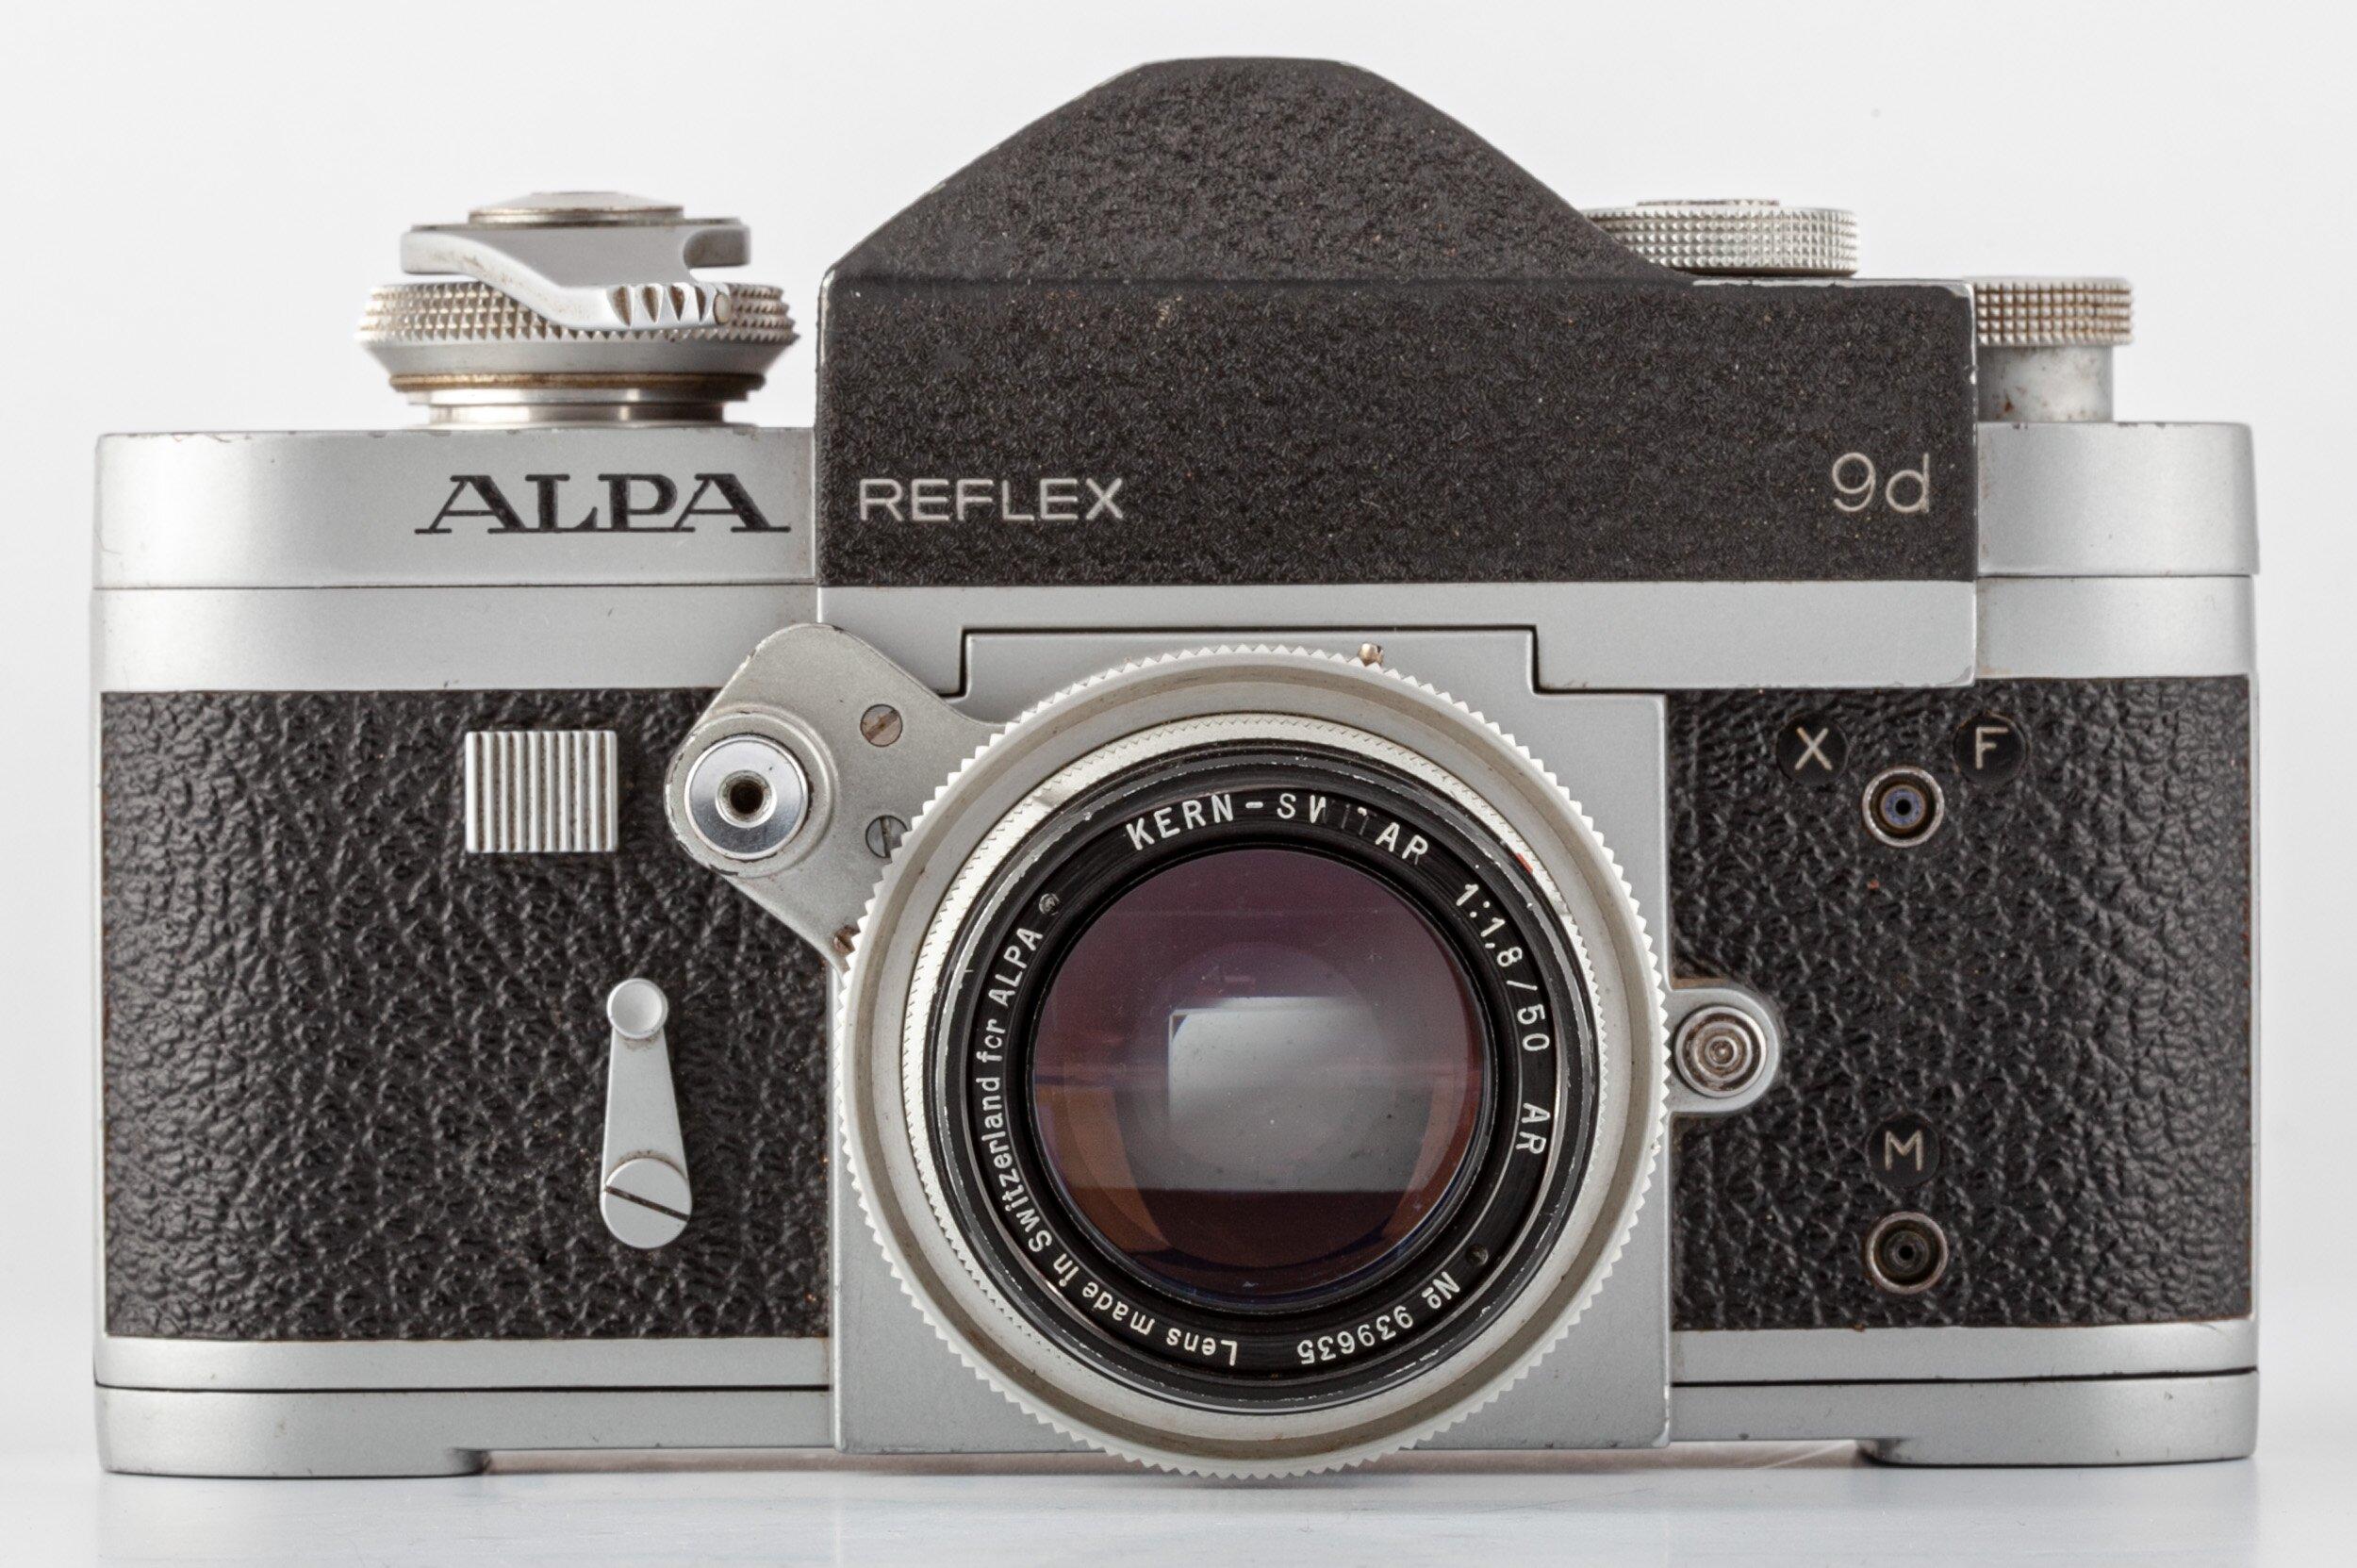 Alpa Reflex 9d  Kern-Switar 1,8/50 AR